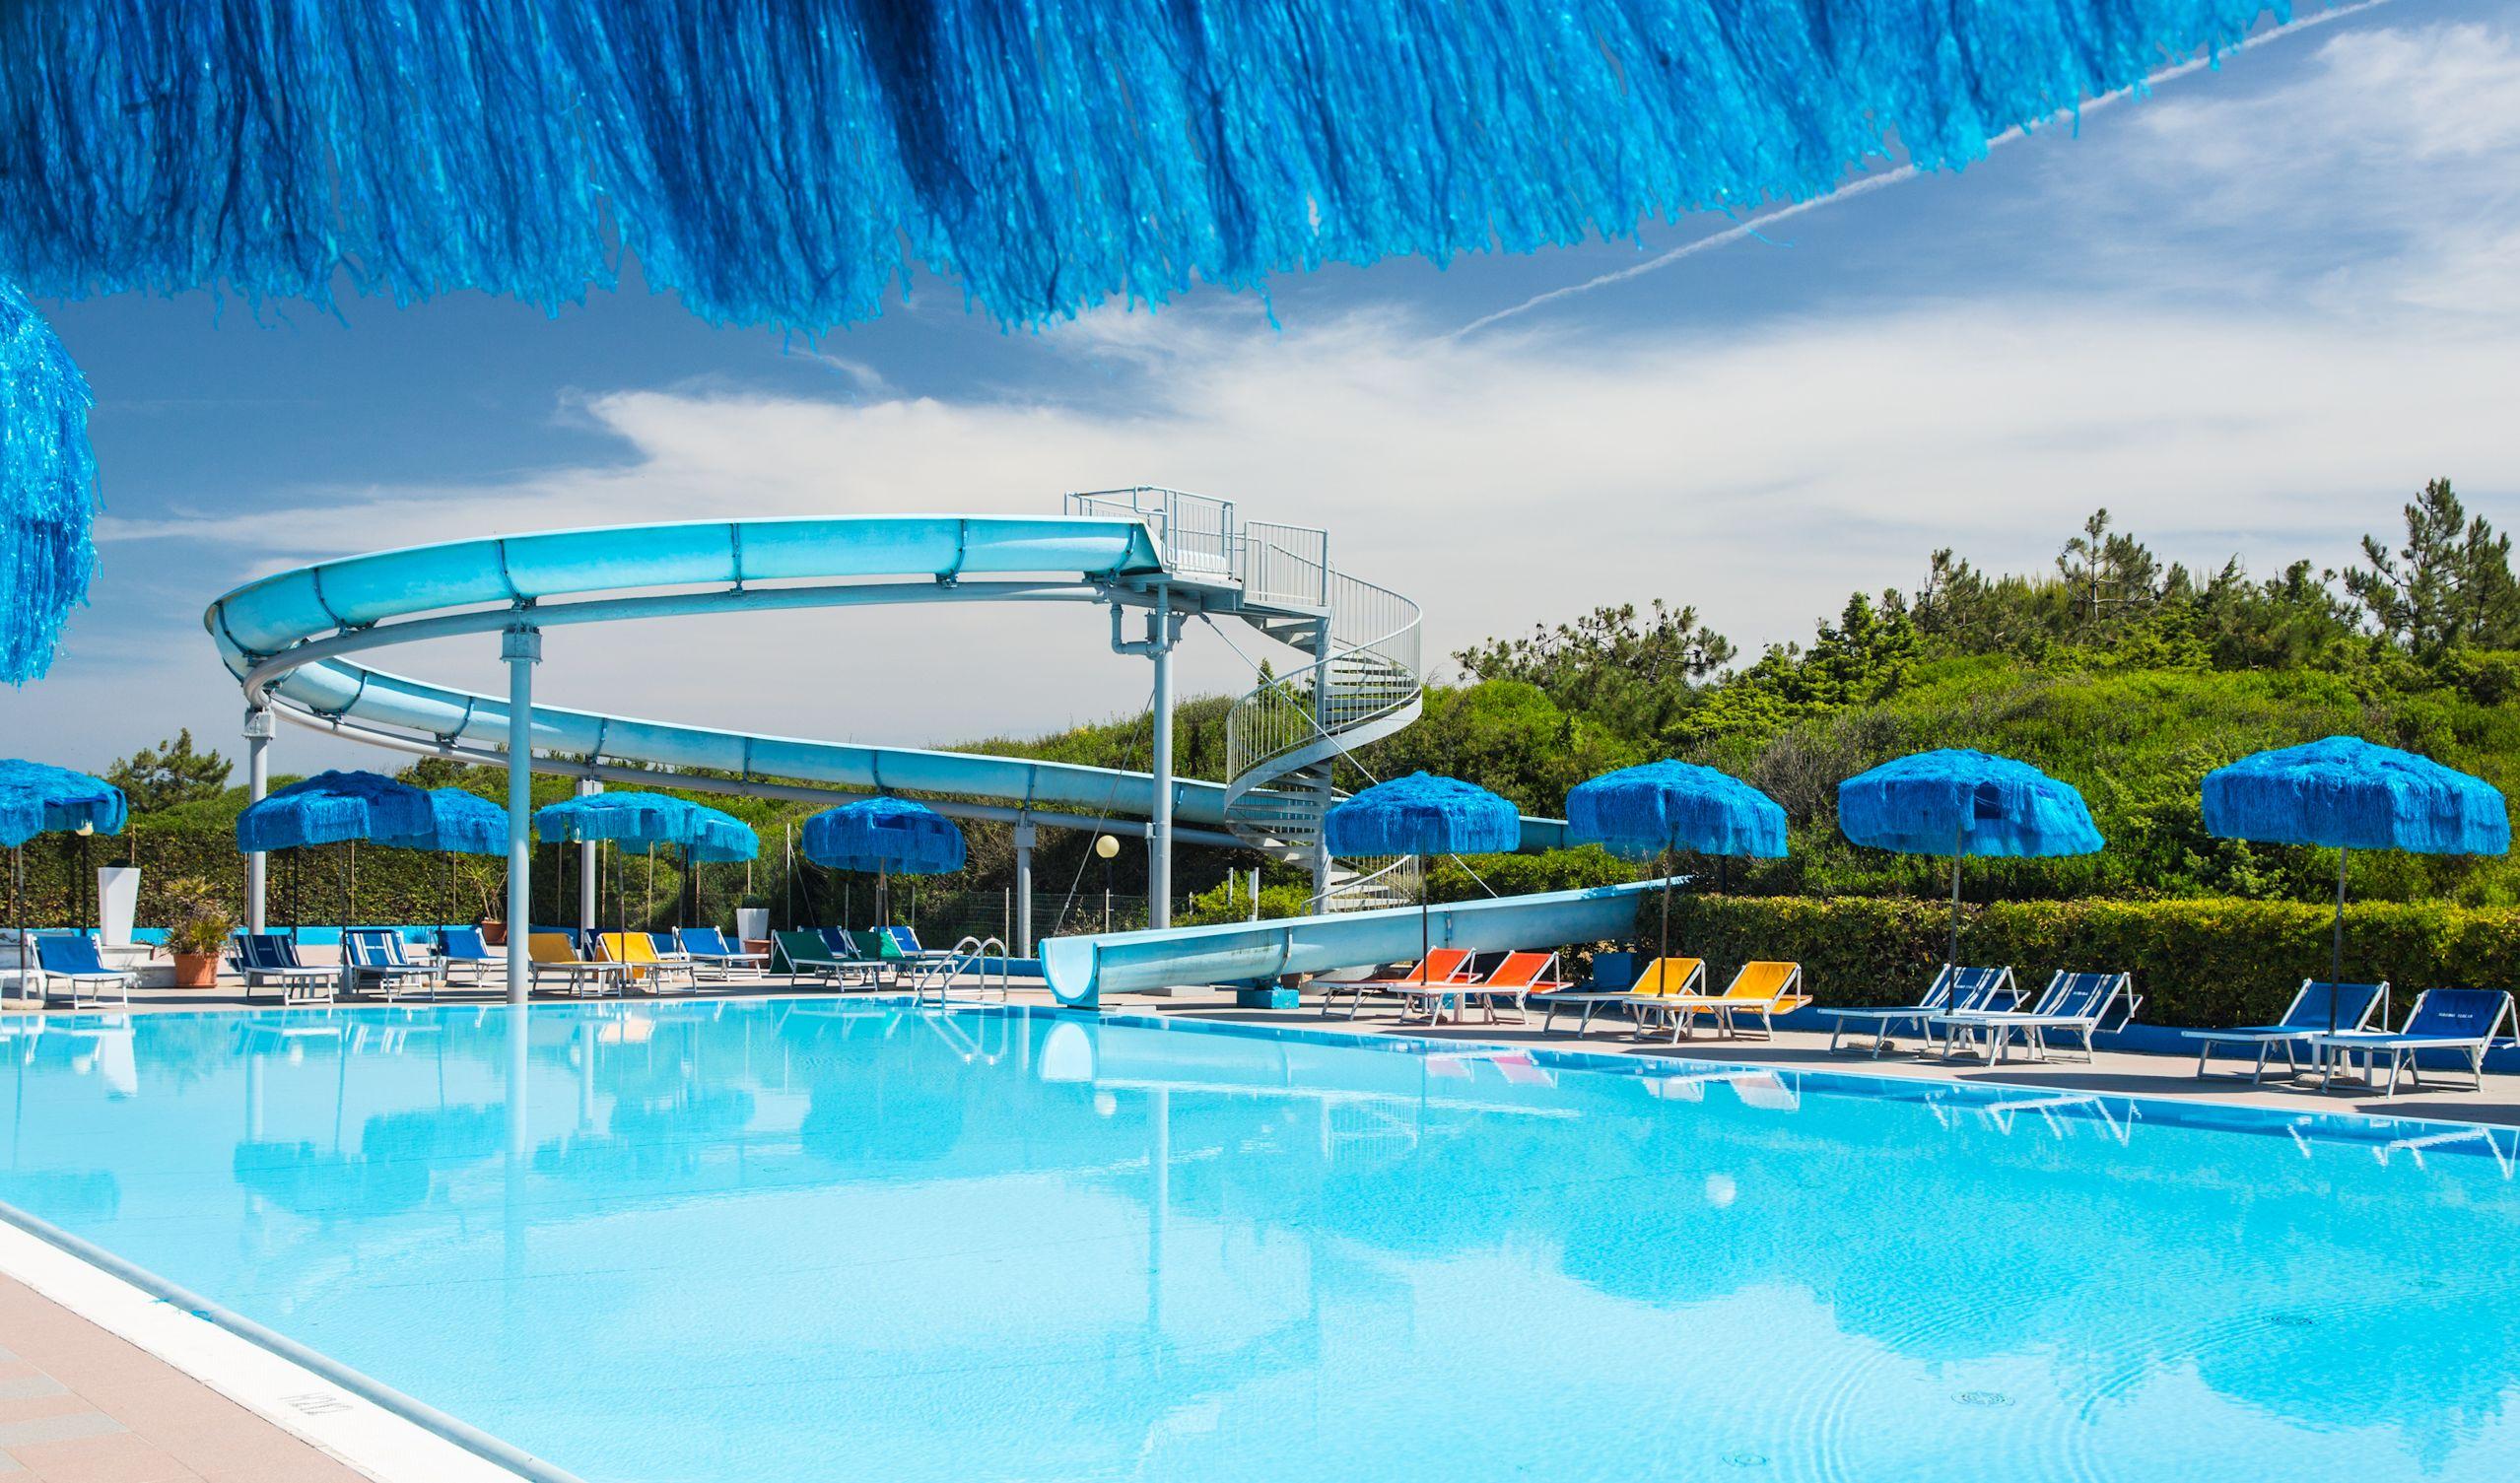 Villaggio camping paradiso viareggio u holidaycheck toskana